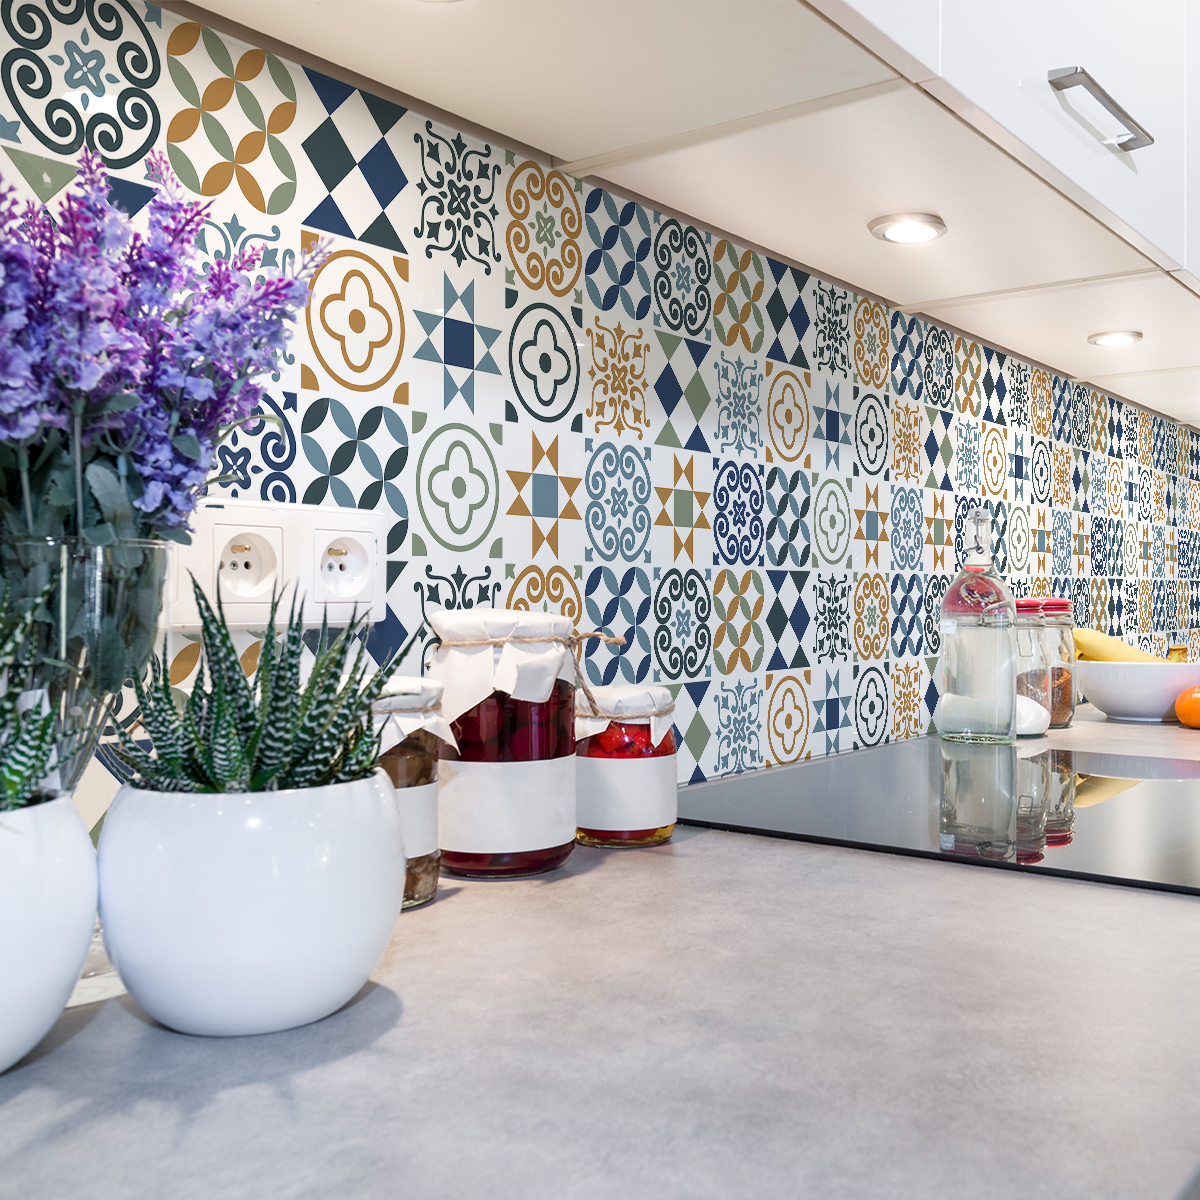 60 stickers carreaux de ciment azulejos hana cuisine carrelages ambiance sticker. Black Bedroom Furniture Sets. Home Design Ideas